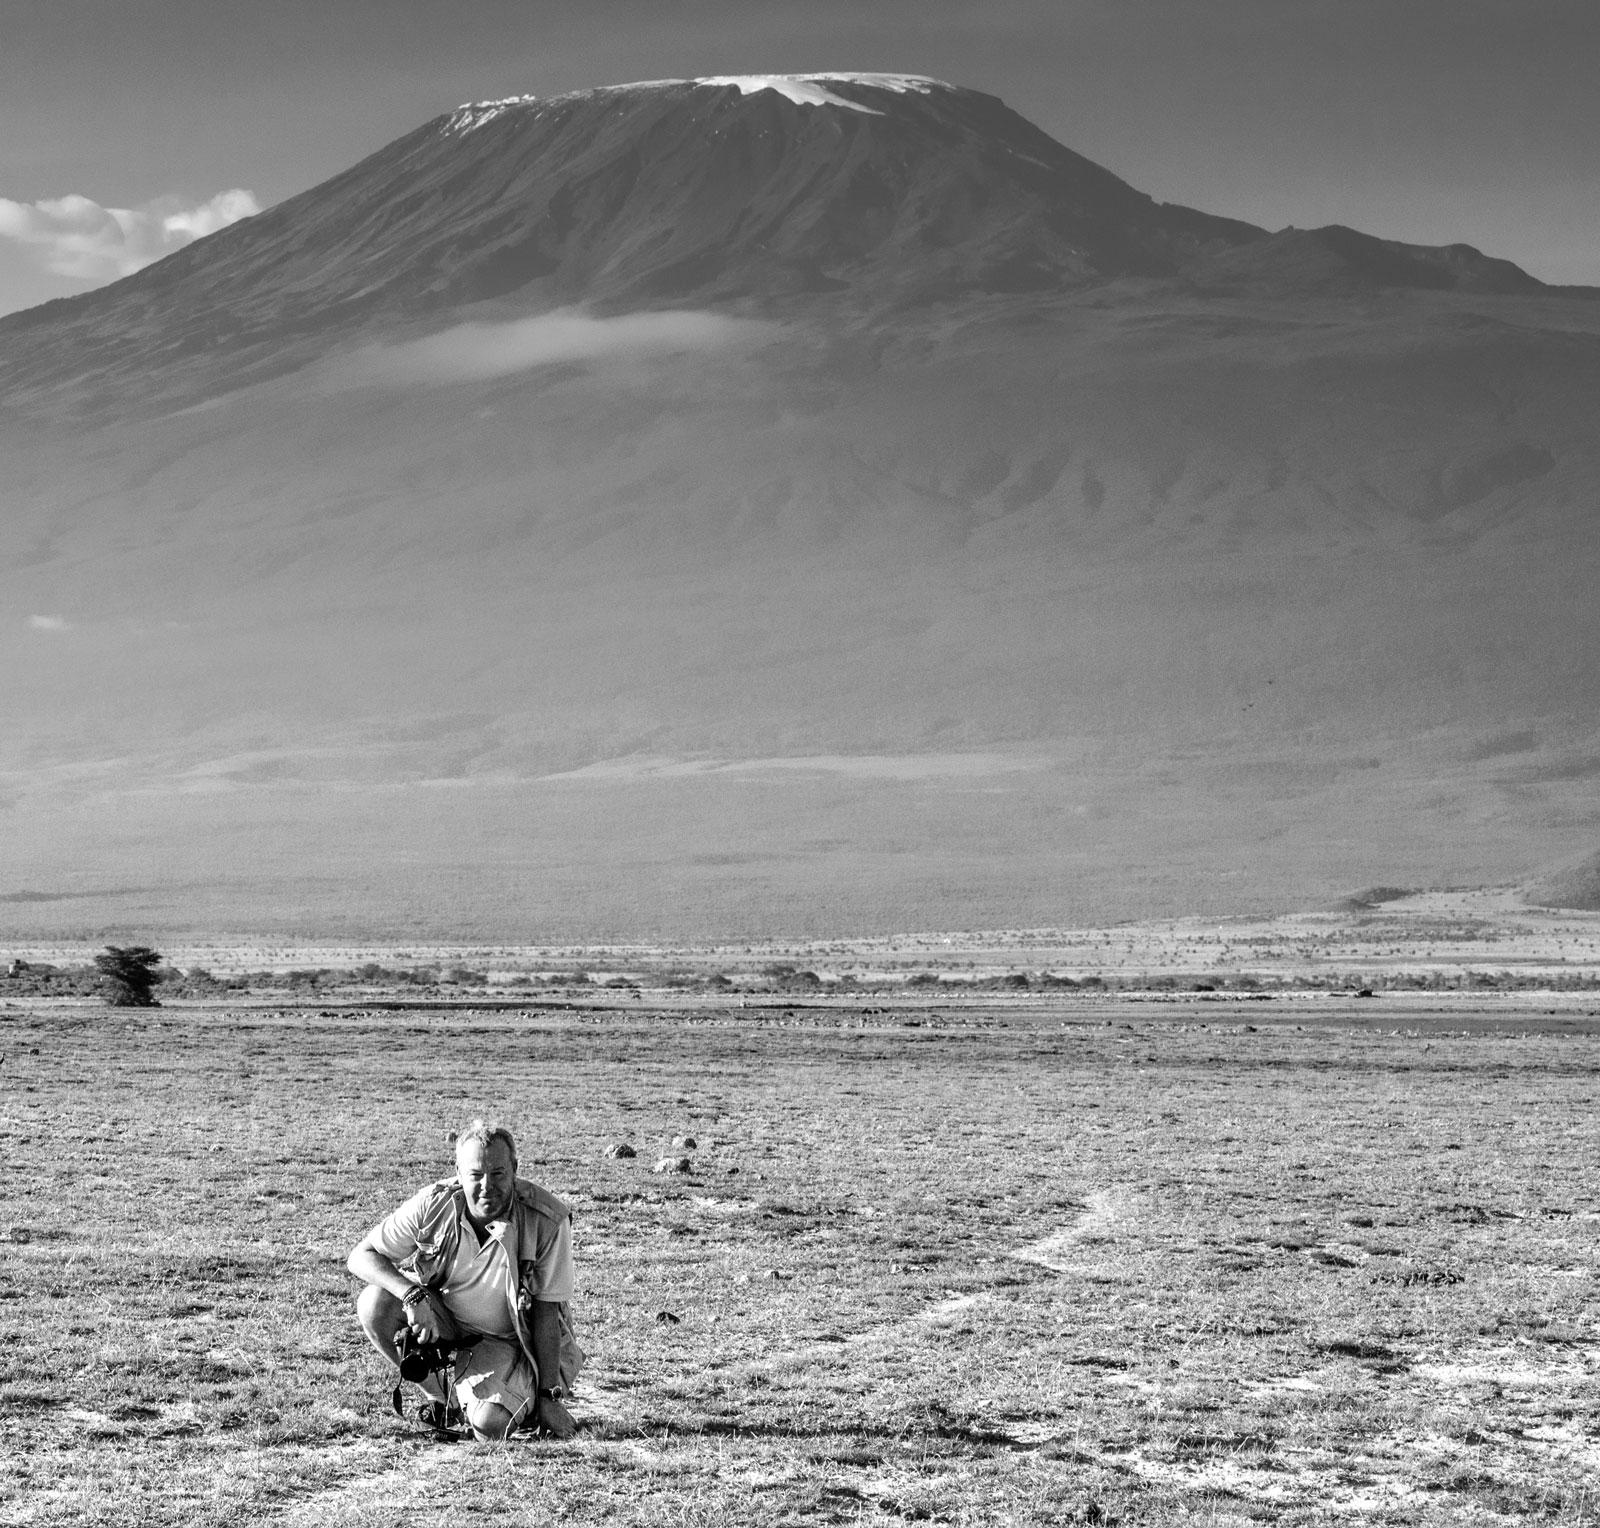 David_Kilimanjaro